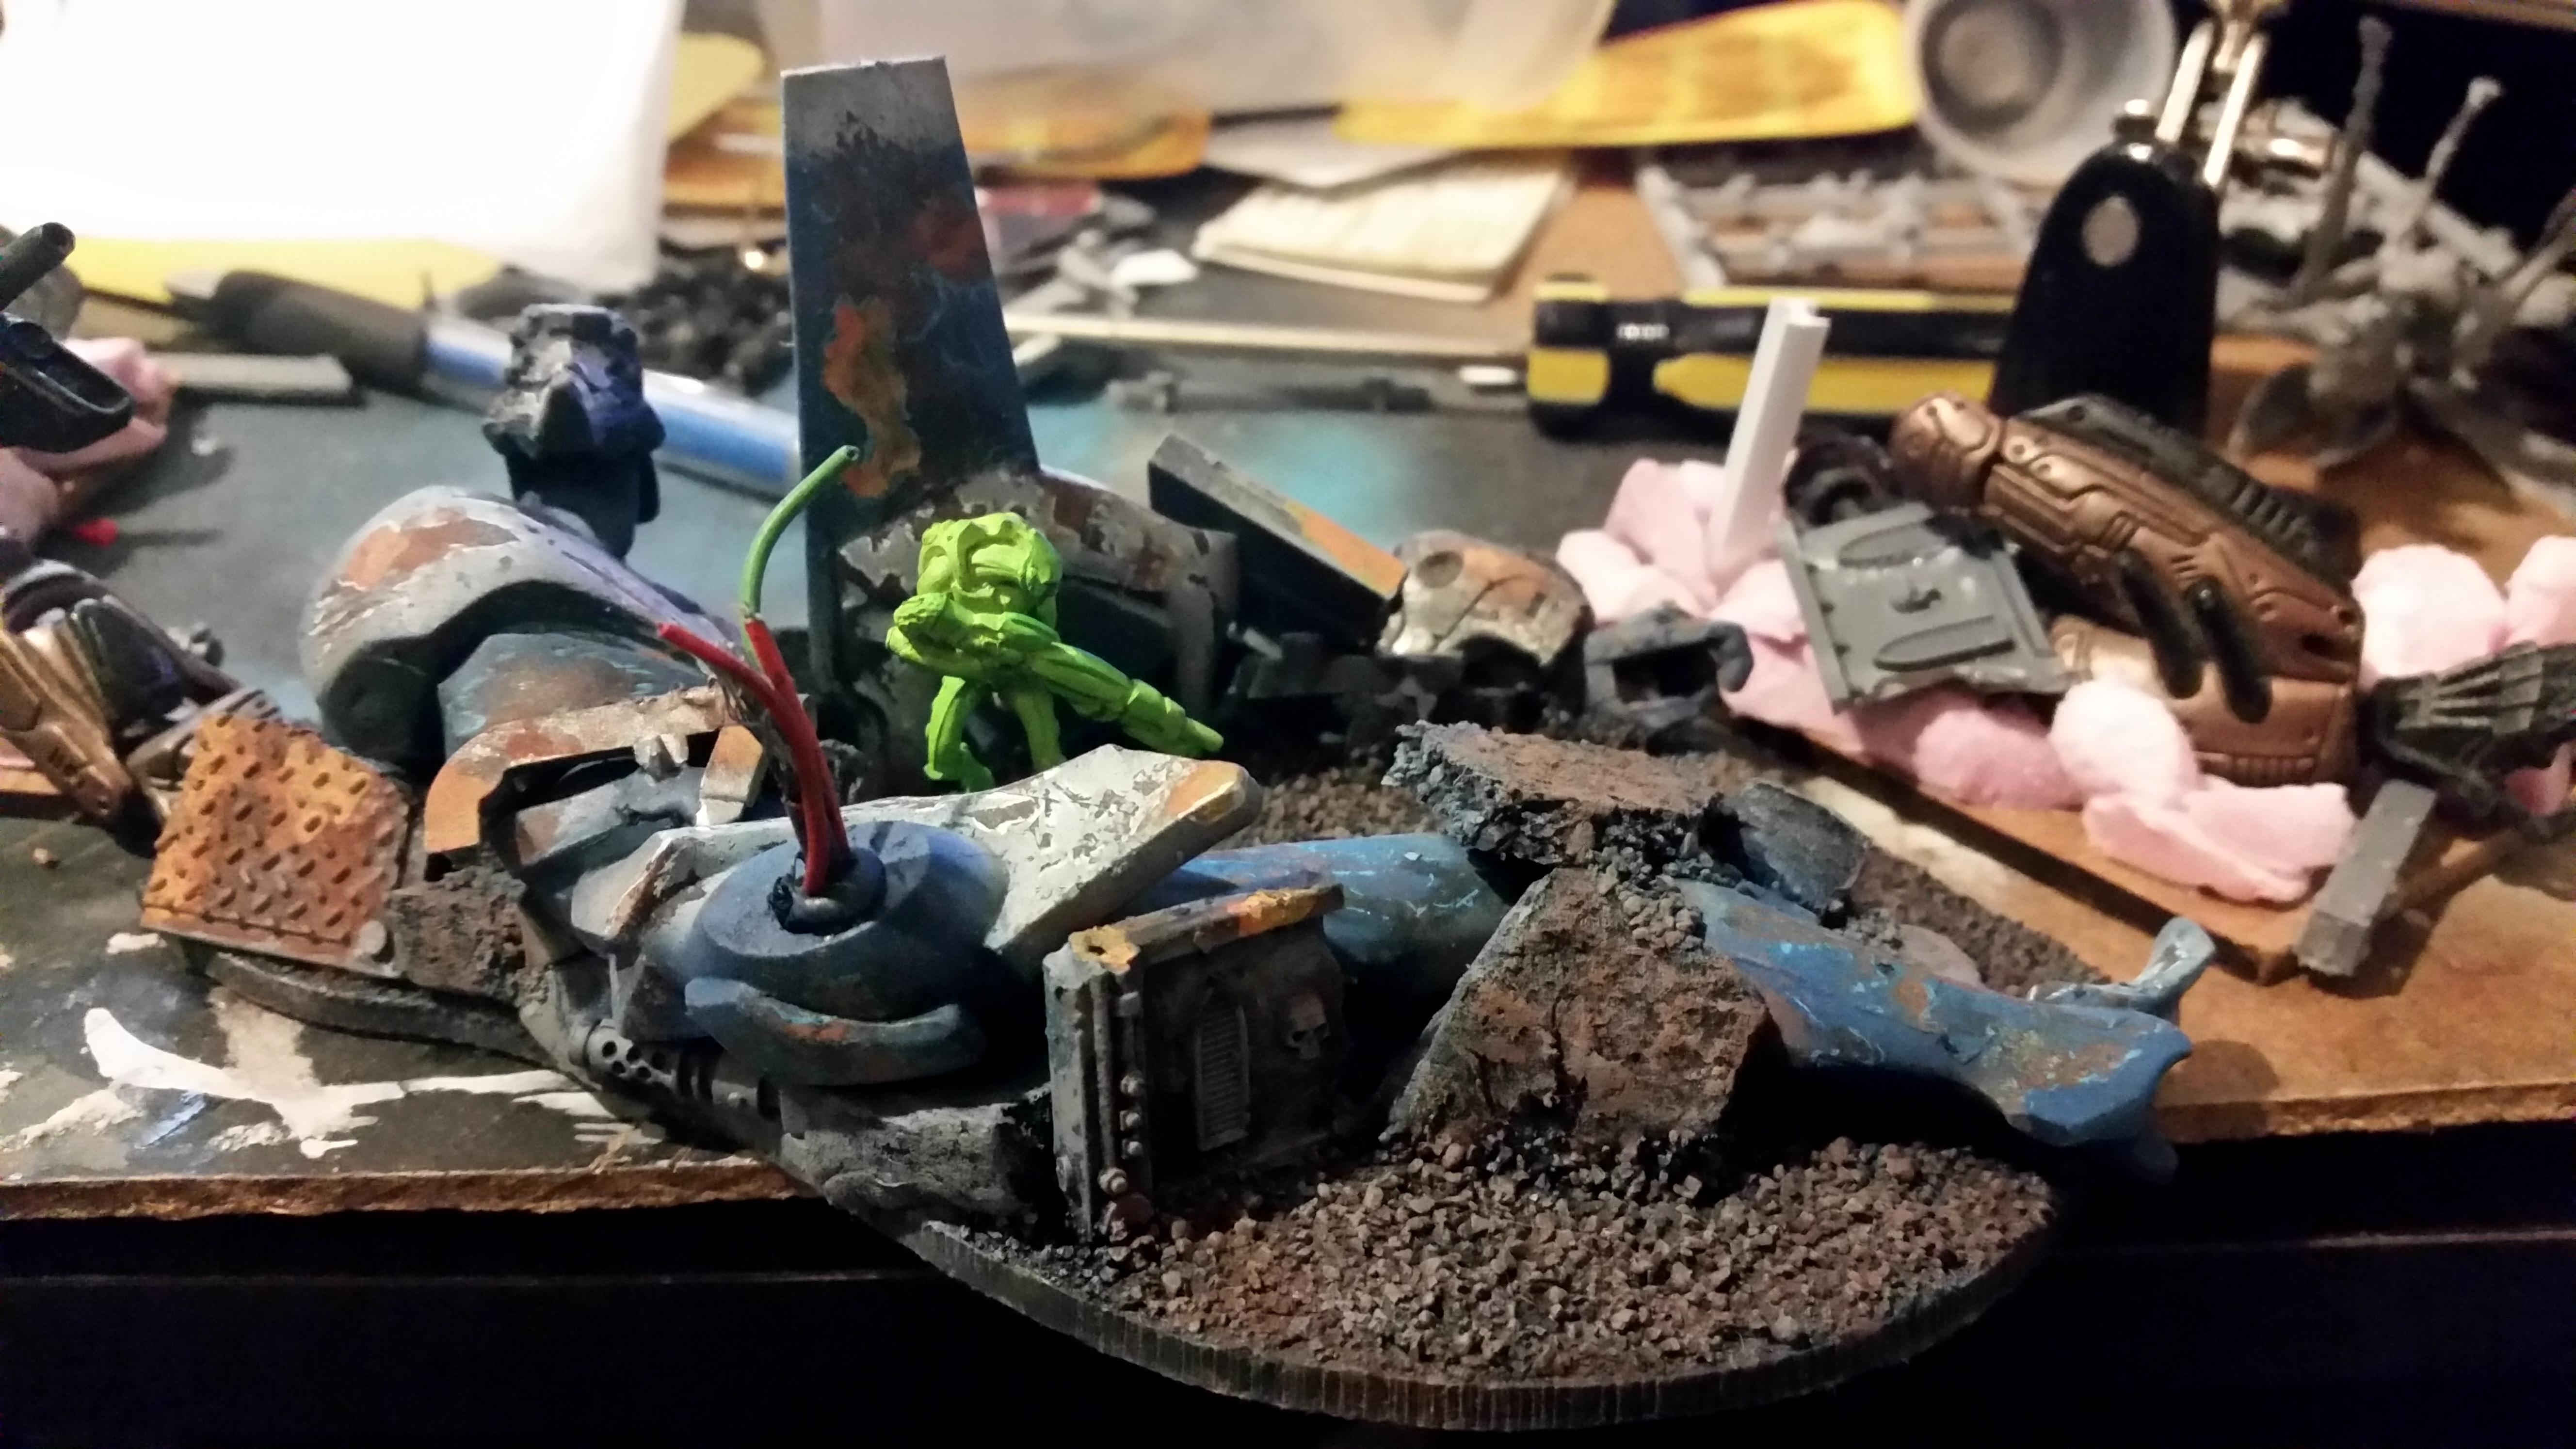 Debris, Eva, Infinity, Infinity The Game, Robot, Ruins, Rust, Weathered